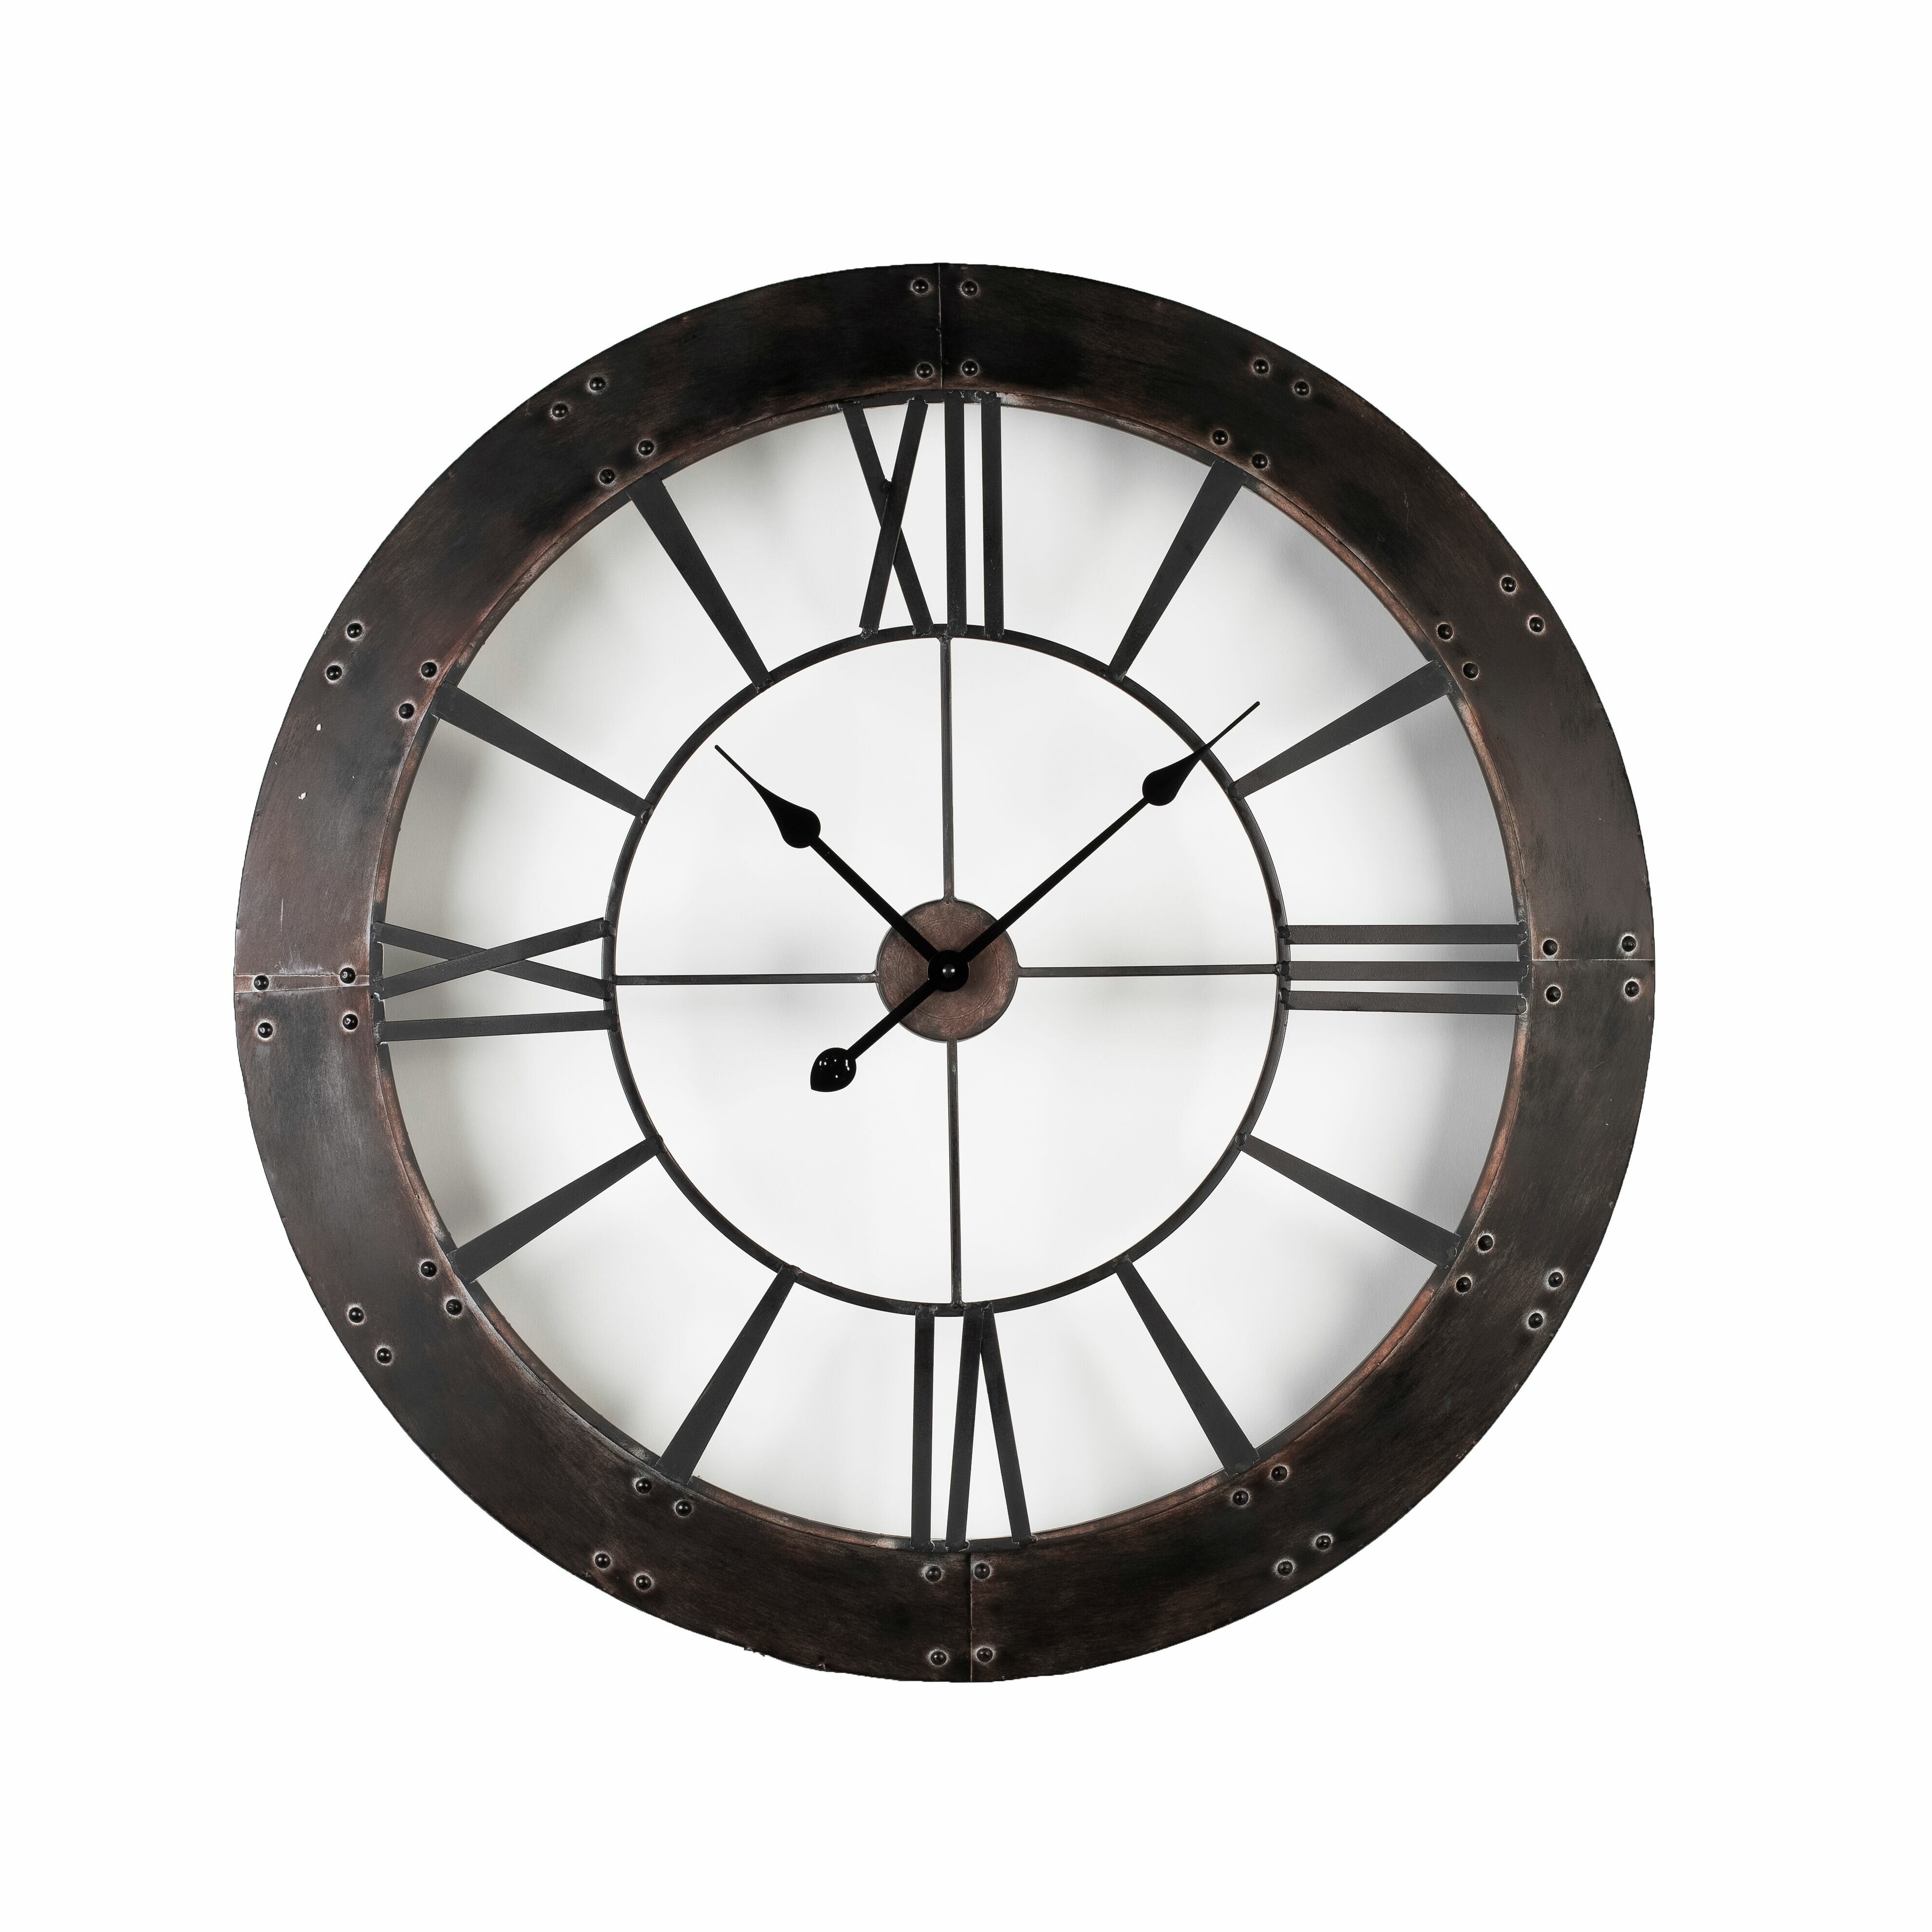 Collectables Collectable Clocks Wall Clock Eye Test Printed Acryl Acrylglas Vintage Bortexgroup Com